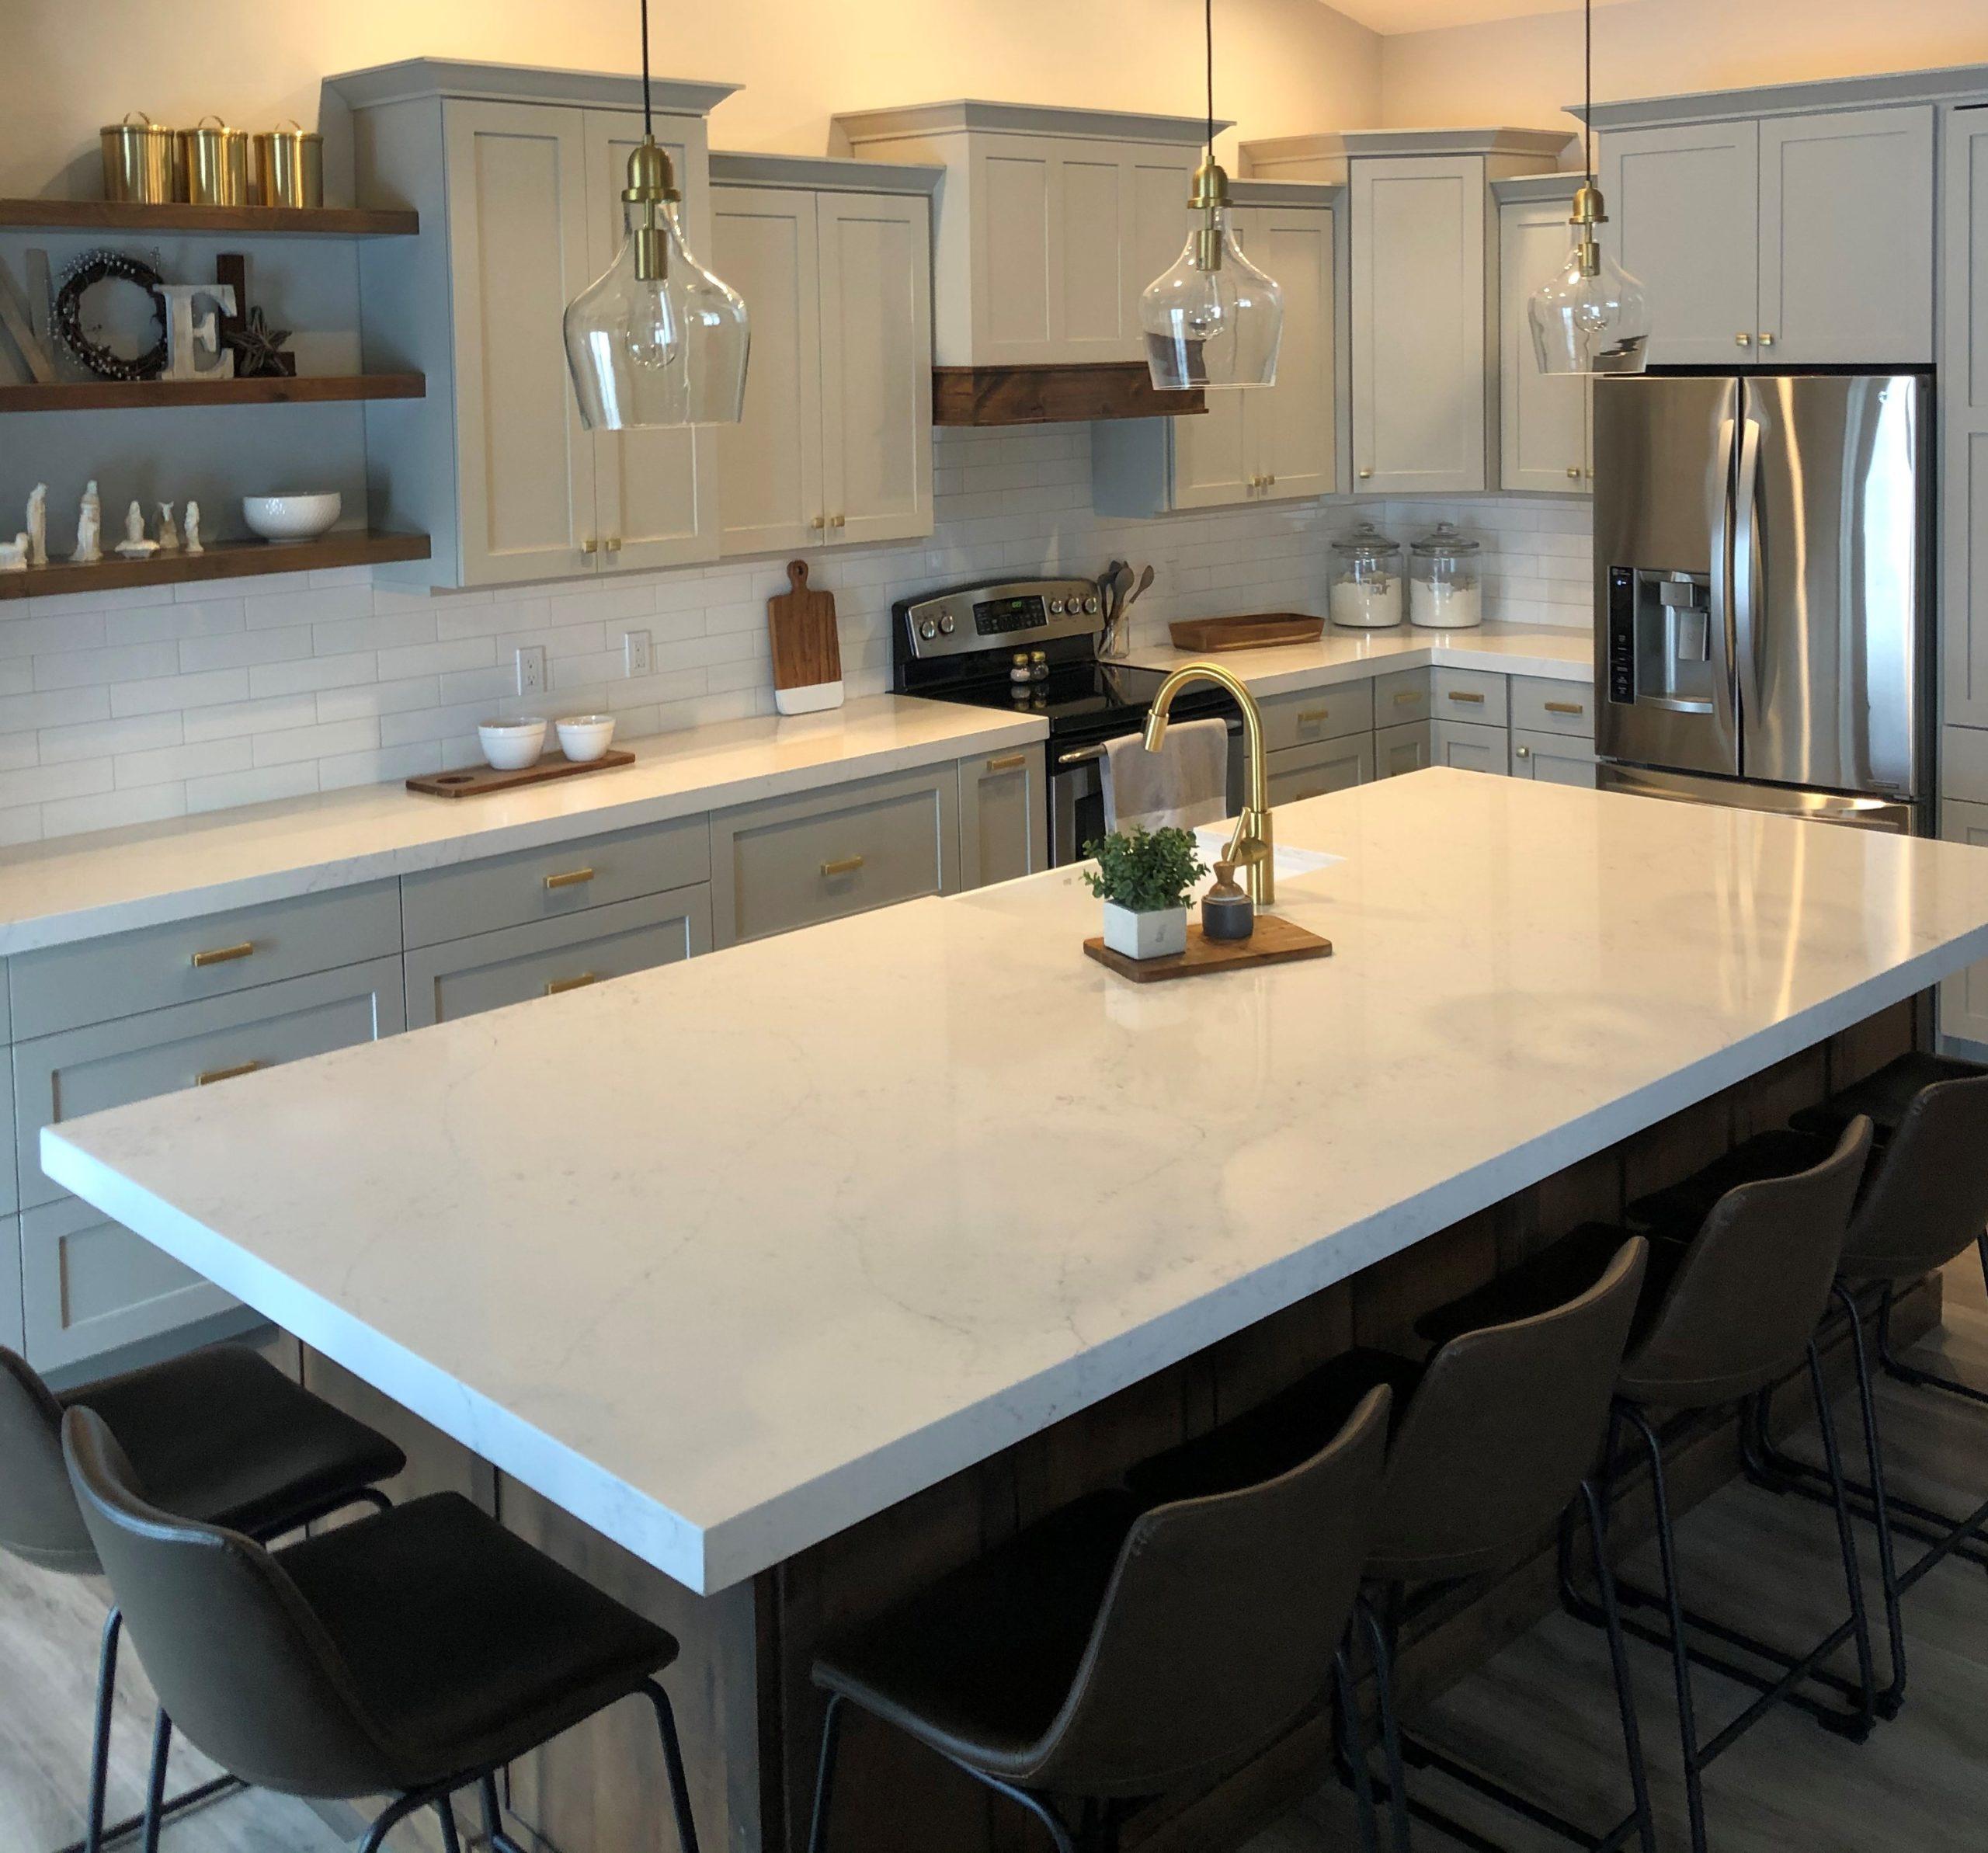 Quartz VS Granite: Which is better? - ITS Countertops